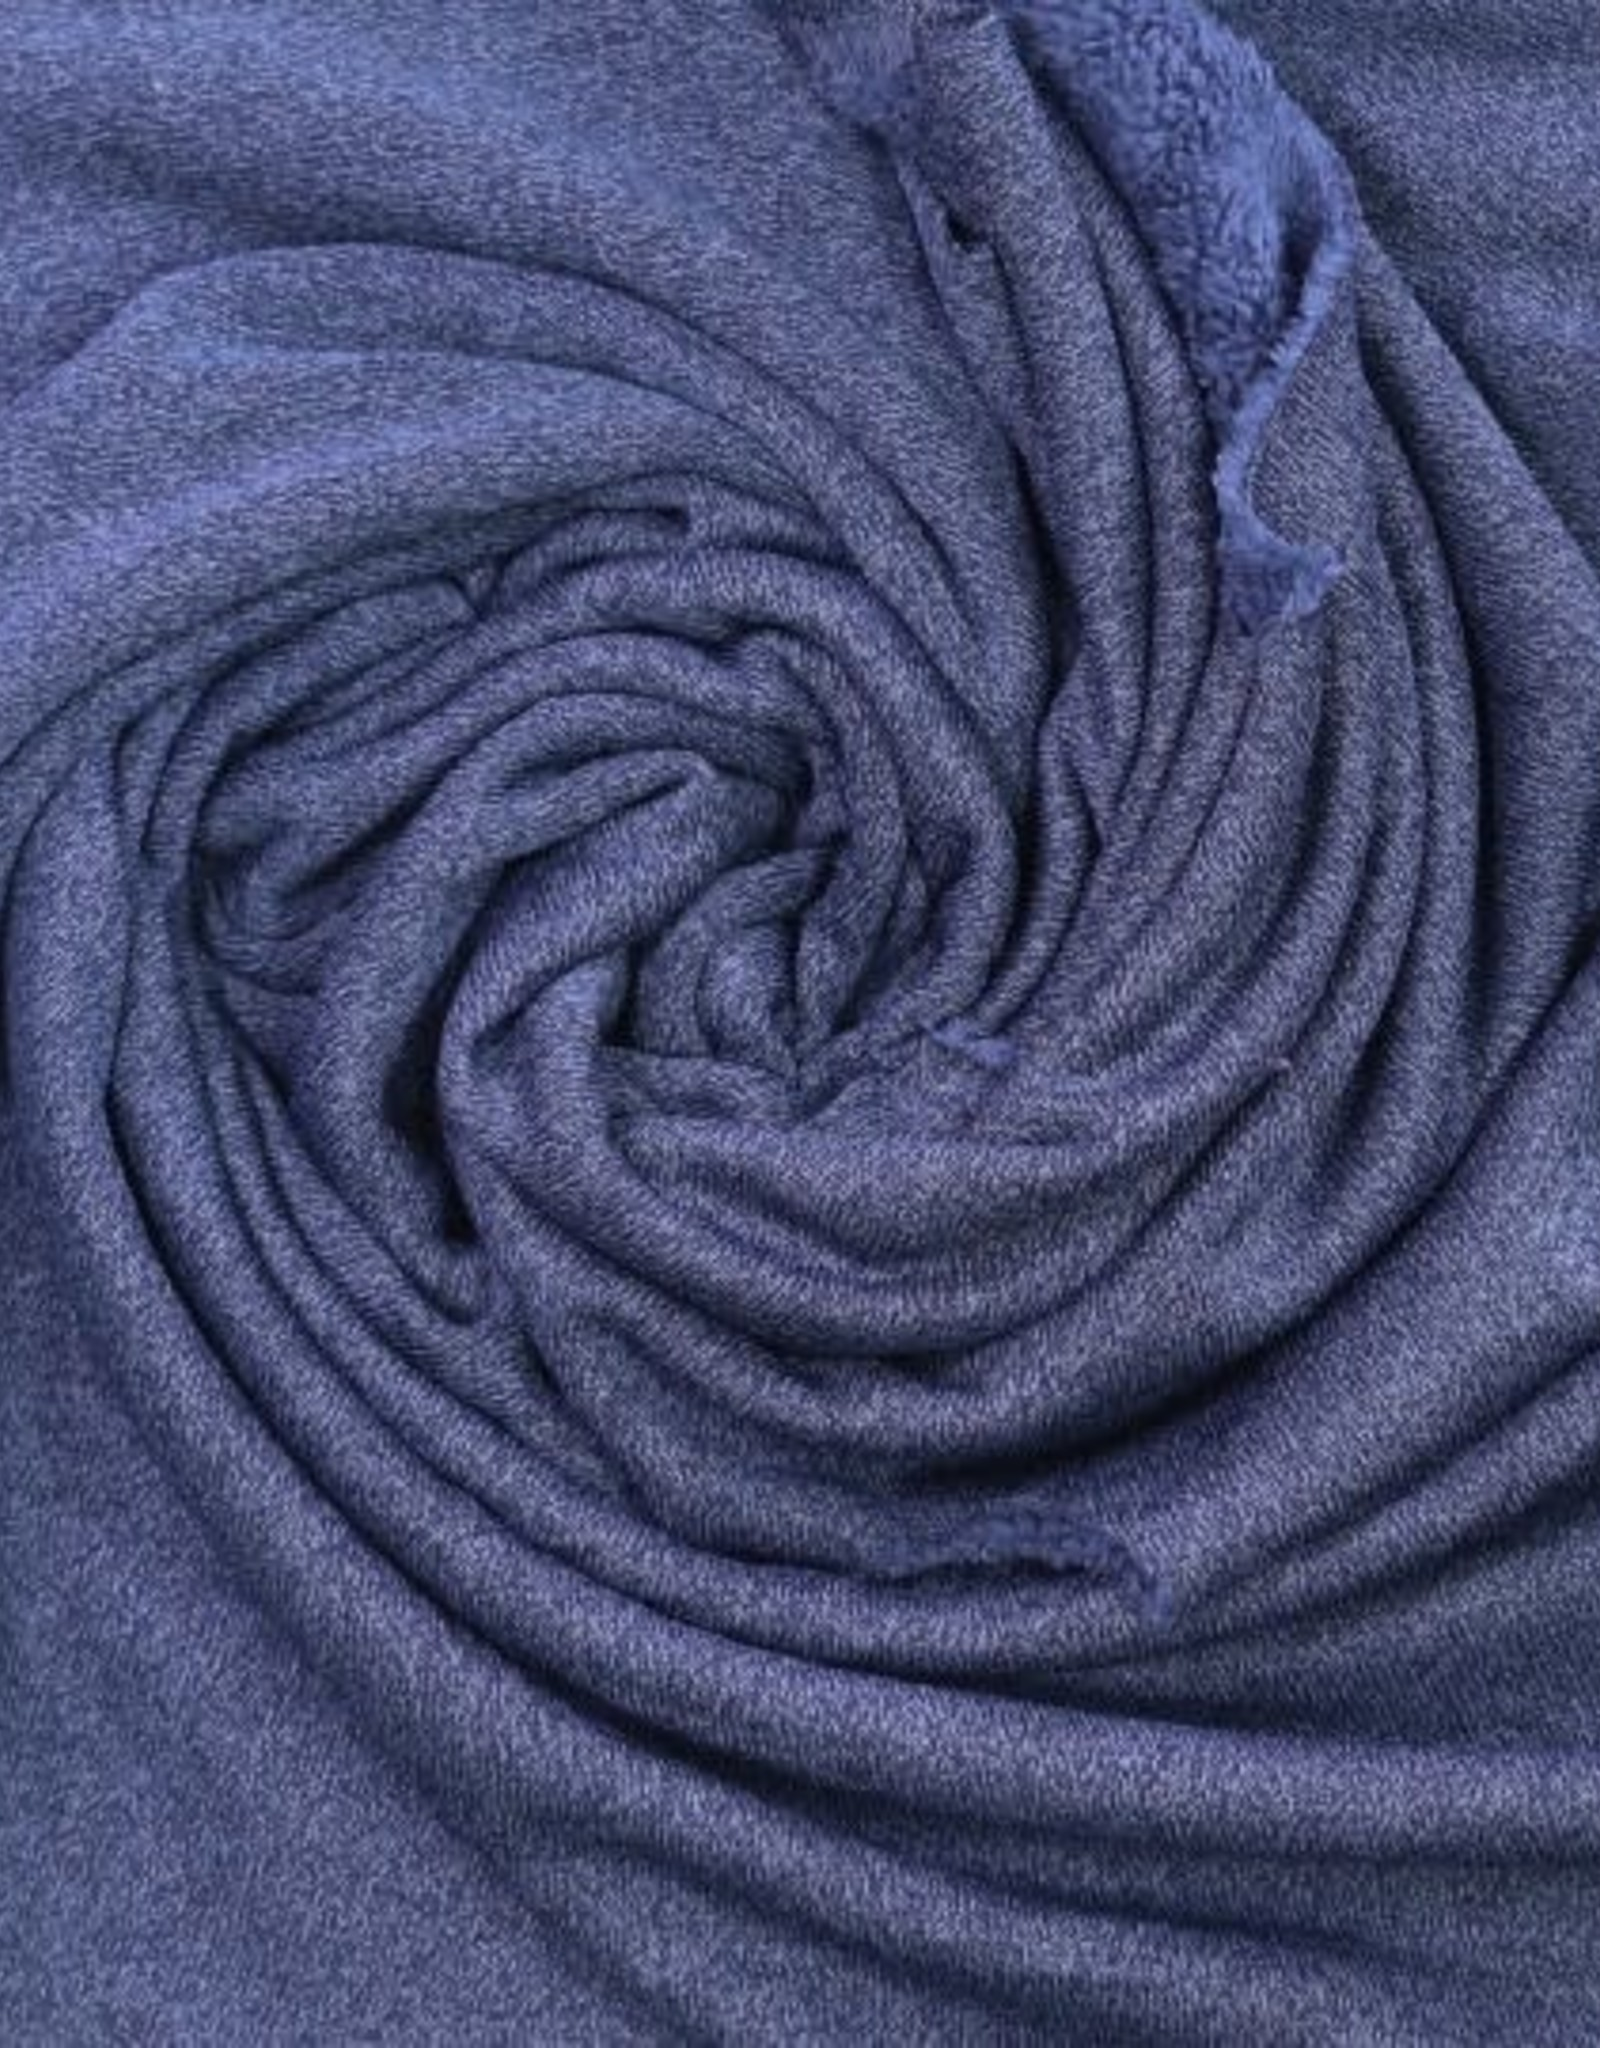 Polytex Polytex  gebreide stof met fleece aan binnenkant blauw